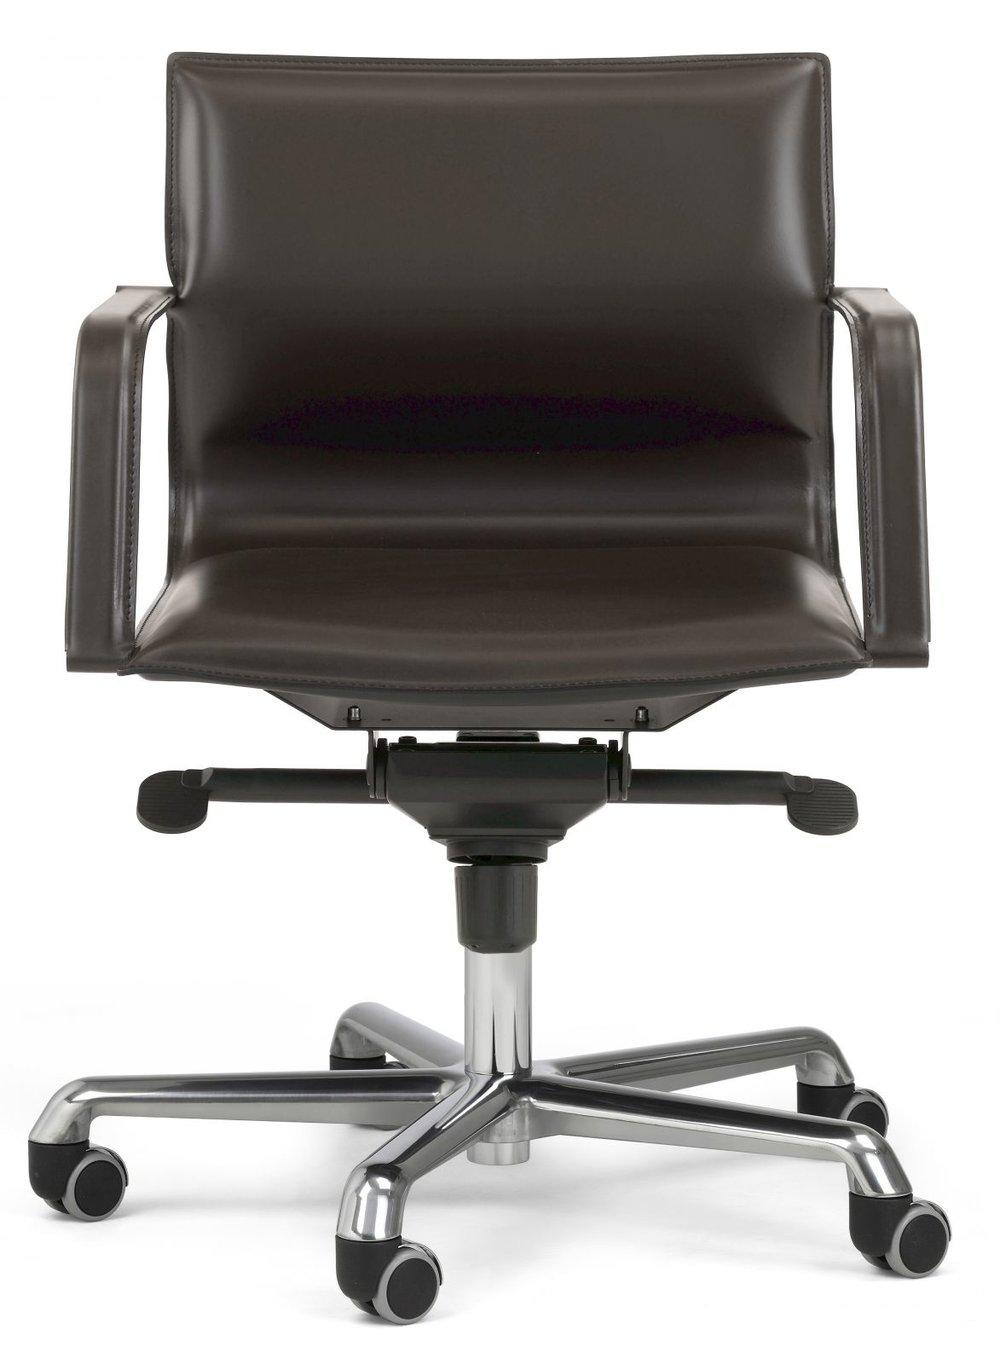 modern-office-chairs-Italian-furniture-designer-chairs (49).jpg